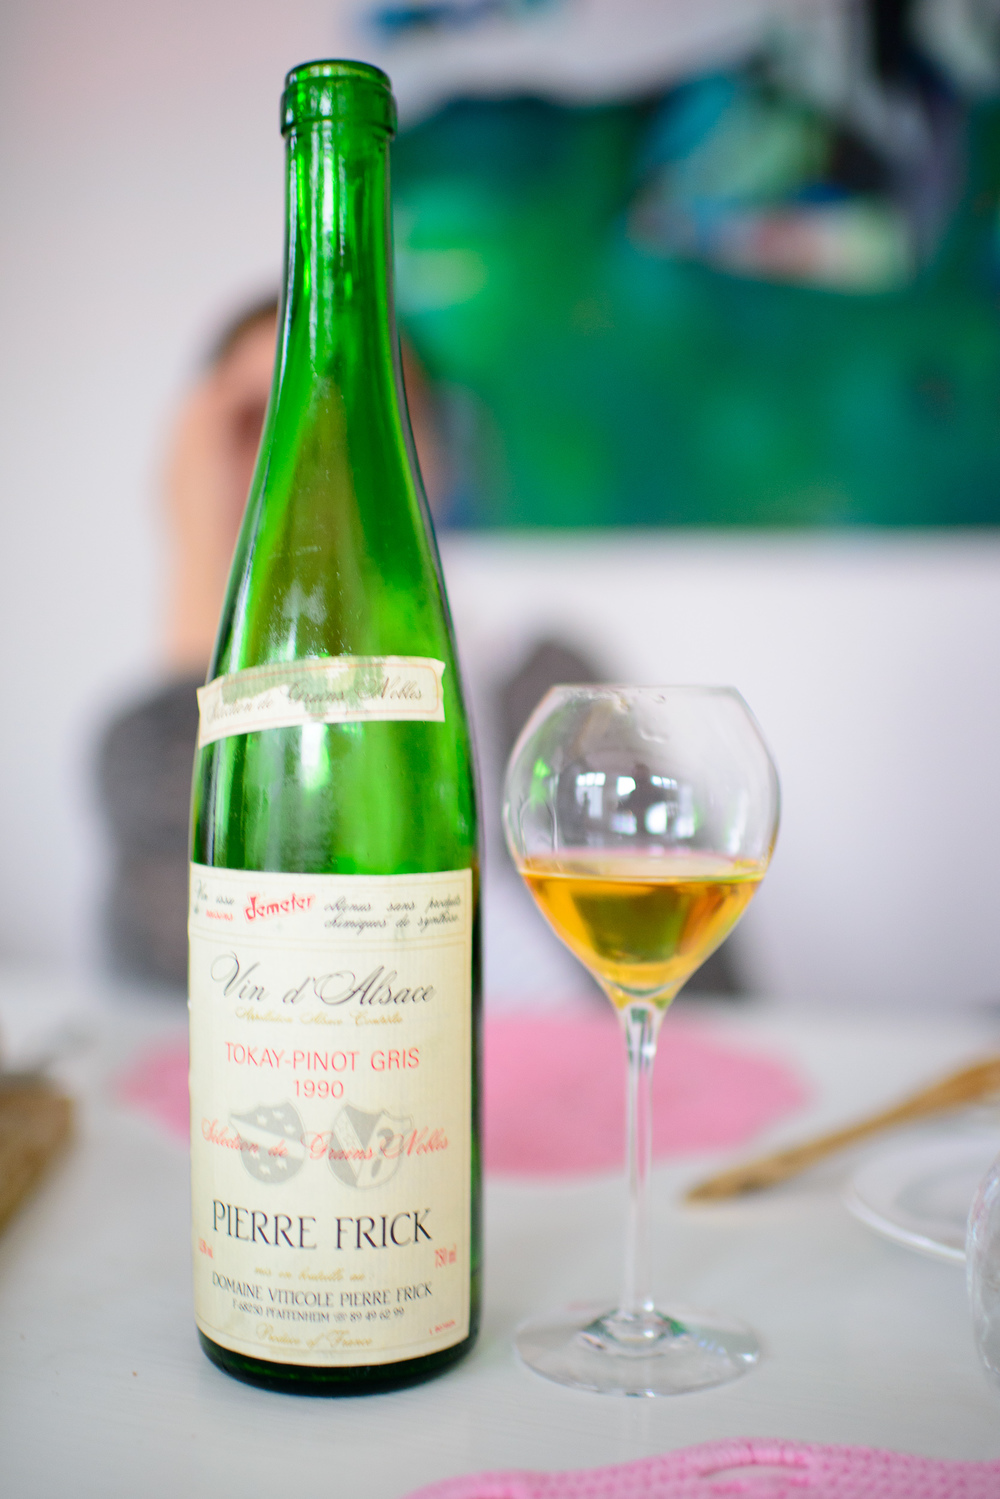 Pierre Frick Tokay Pinot Gris 1990